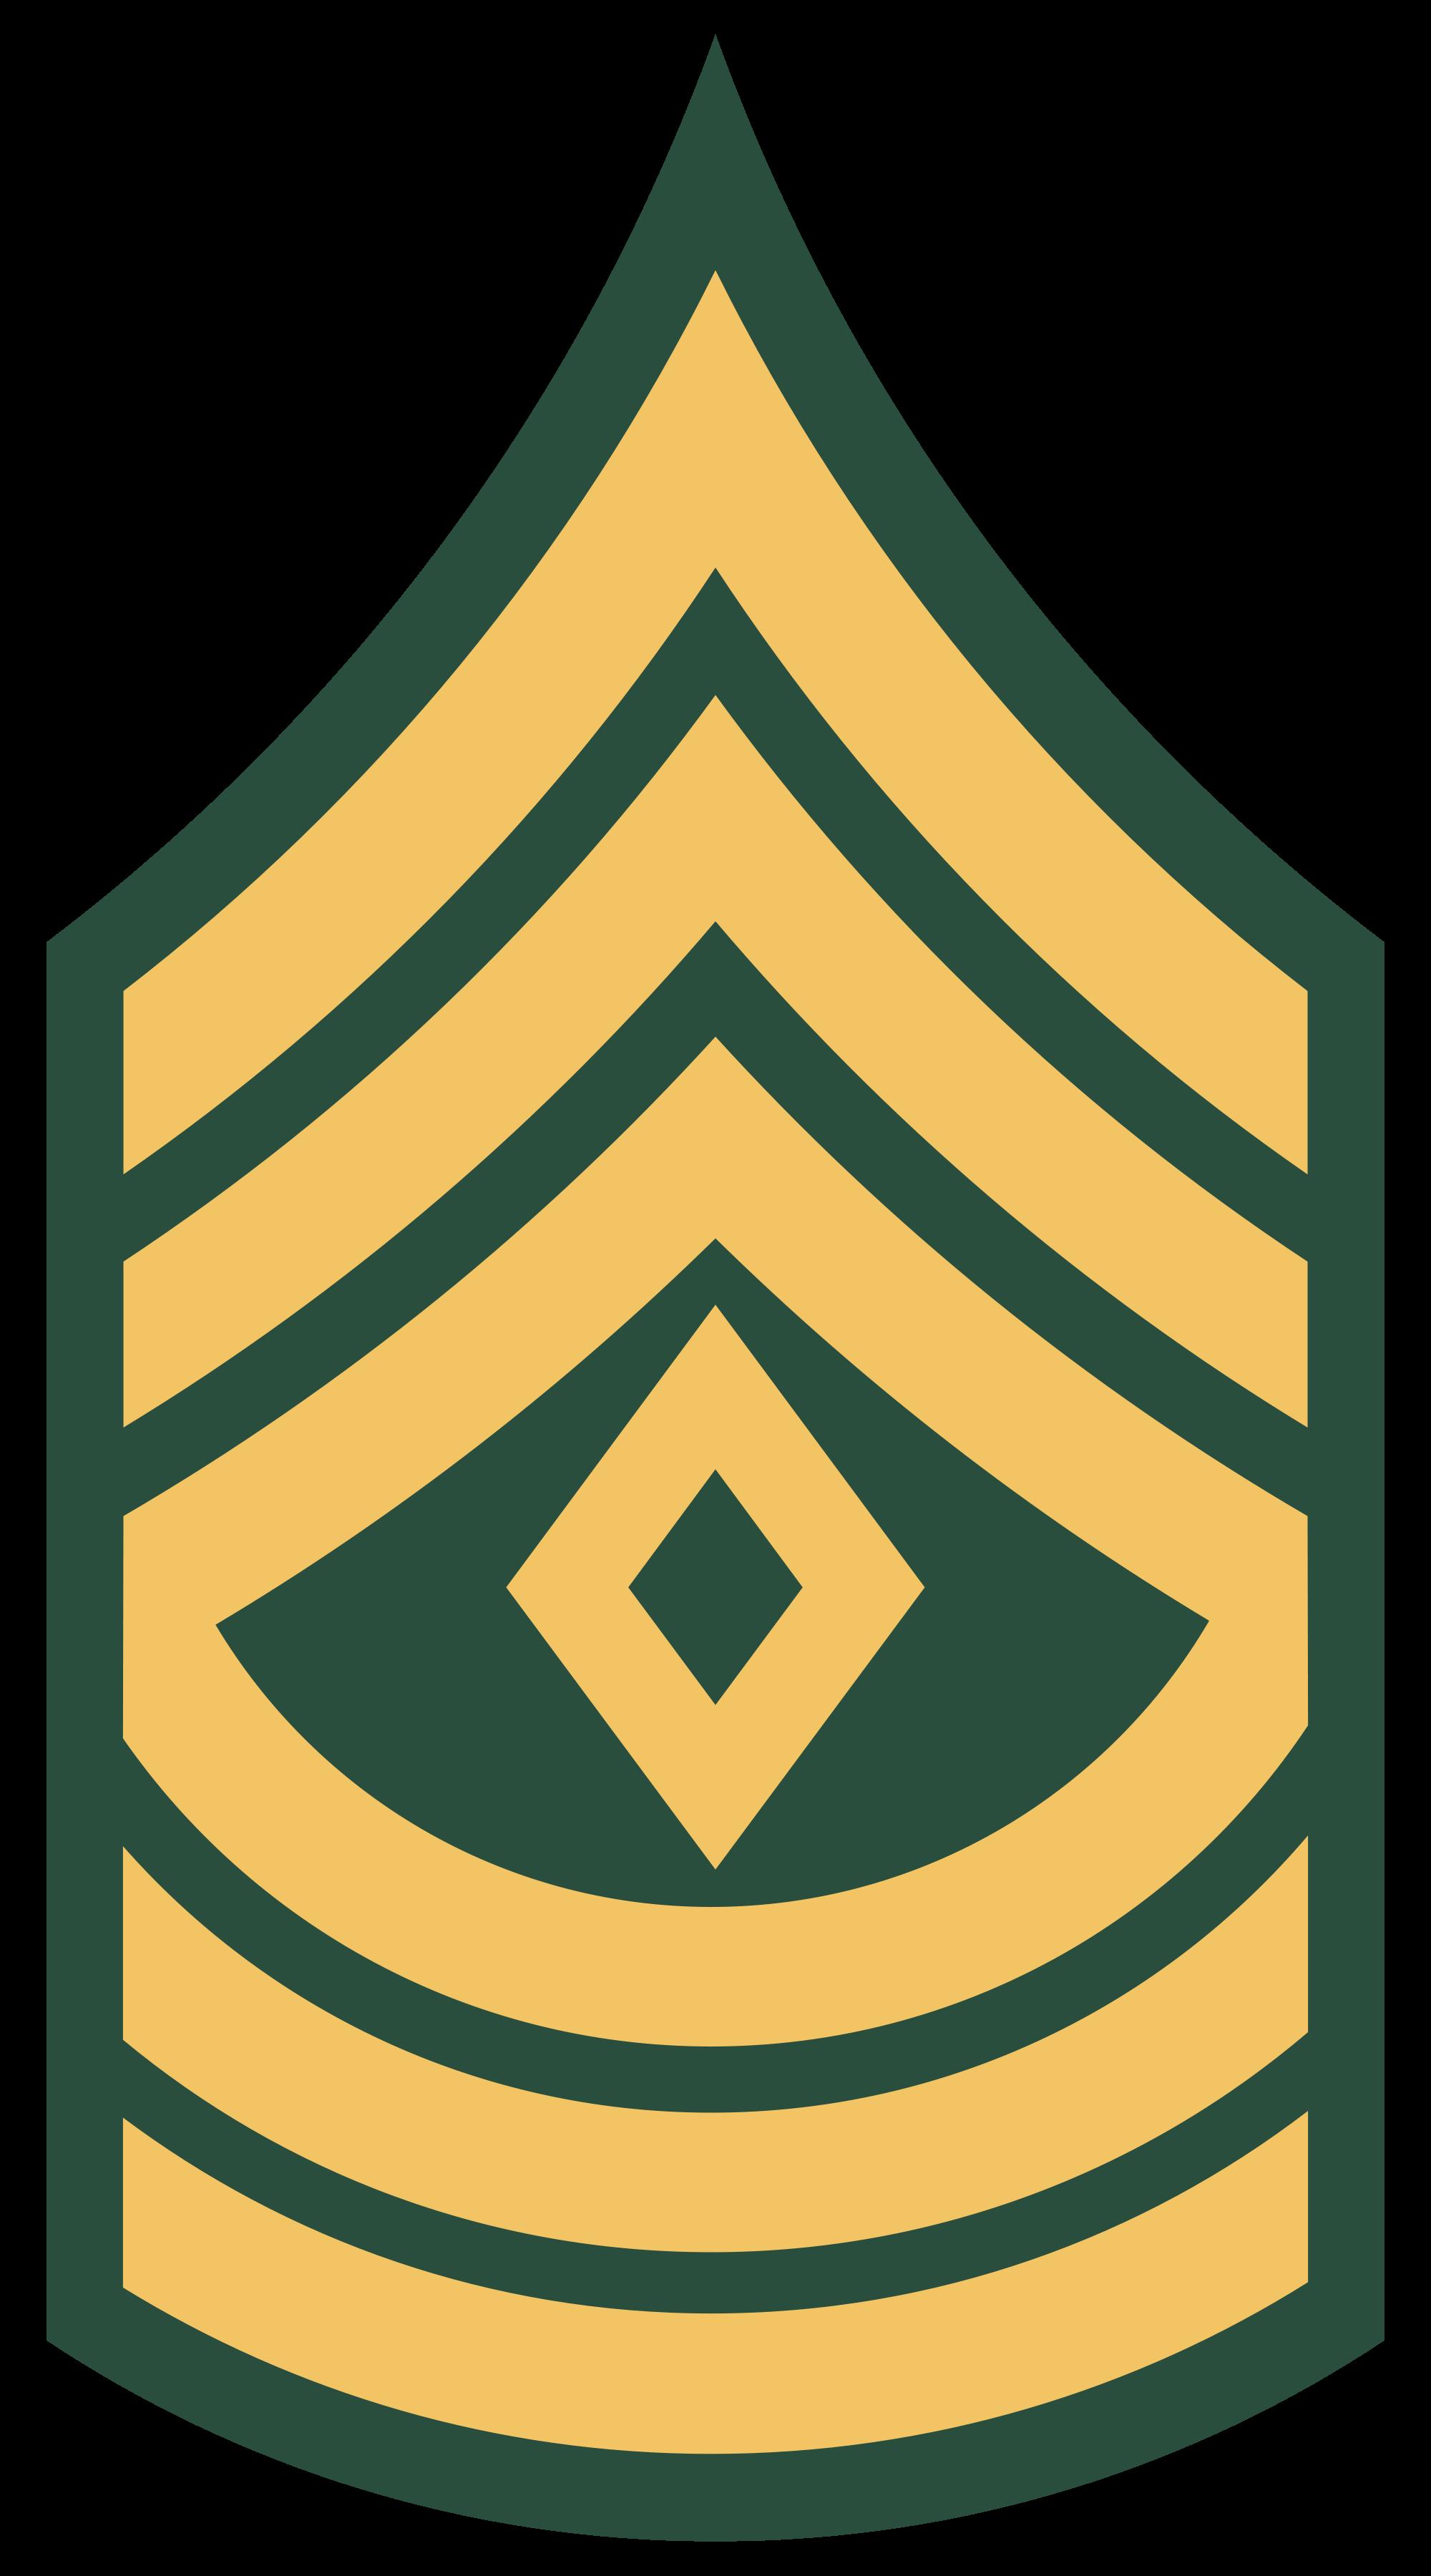 Army logo clipart kid.